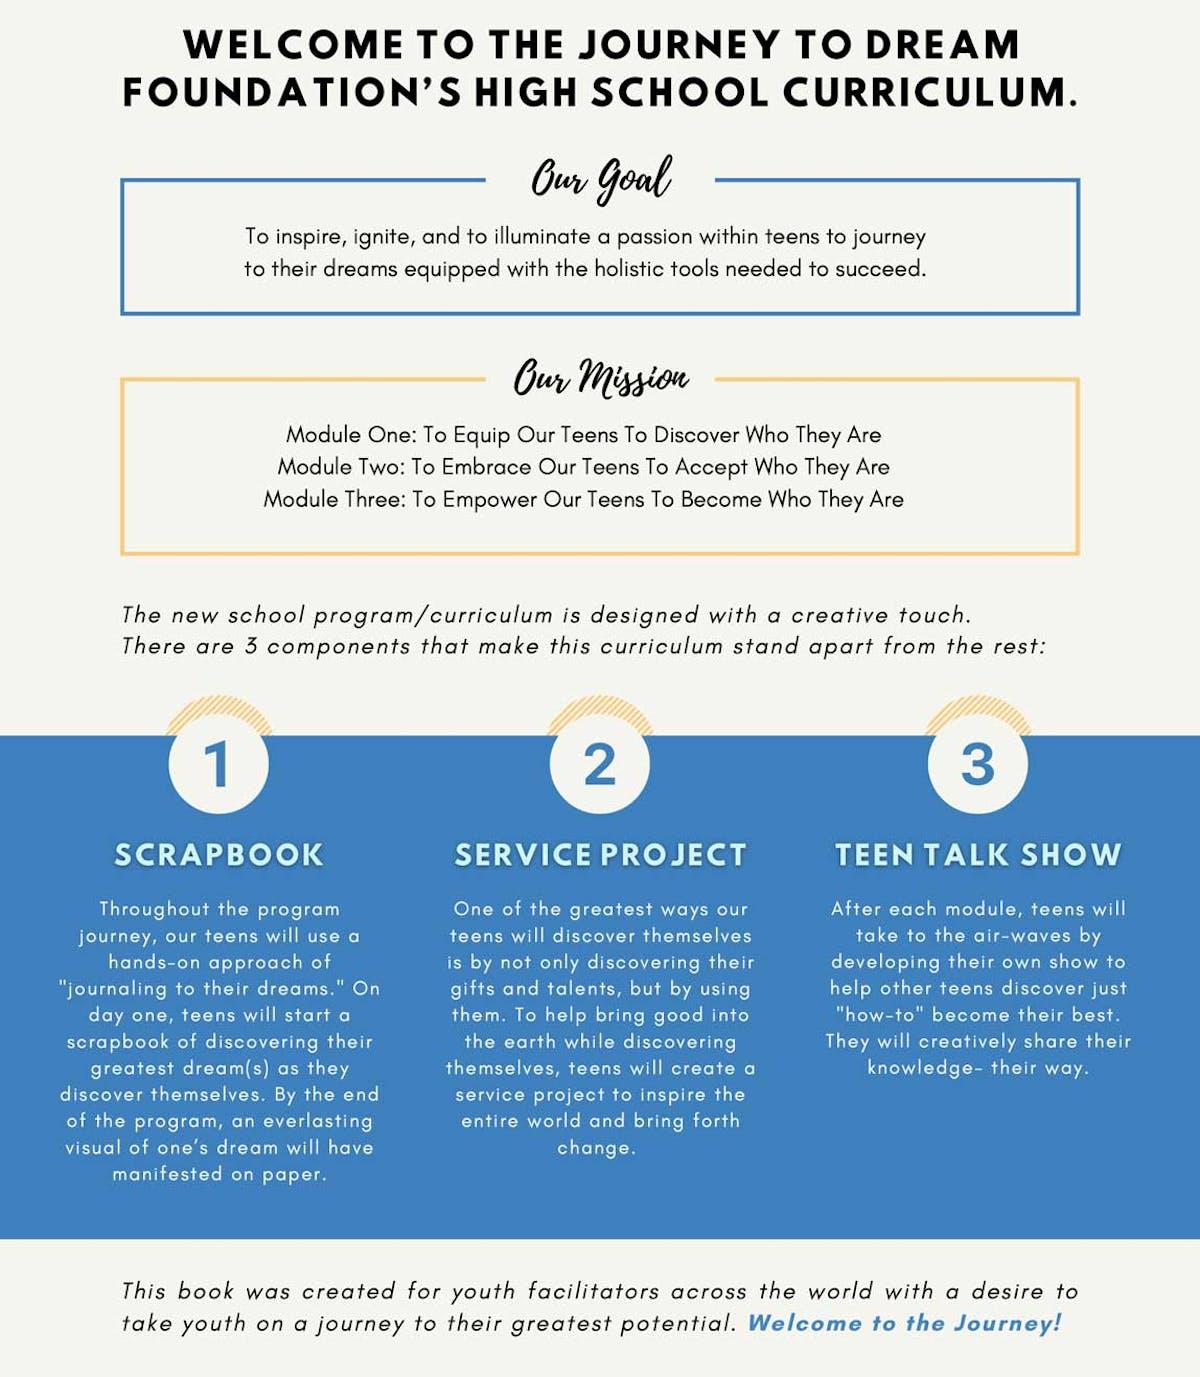 Journey to Dream Foundation's High School Curriculum